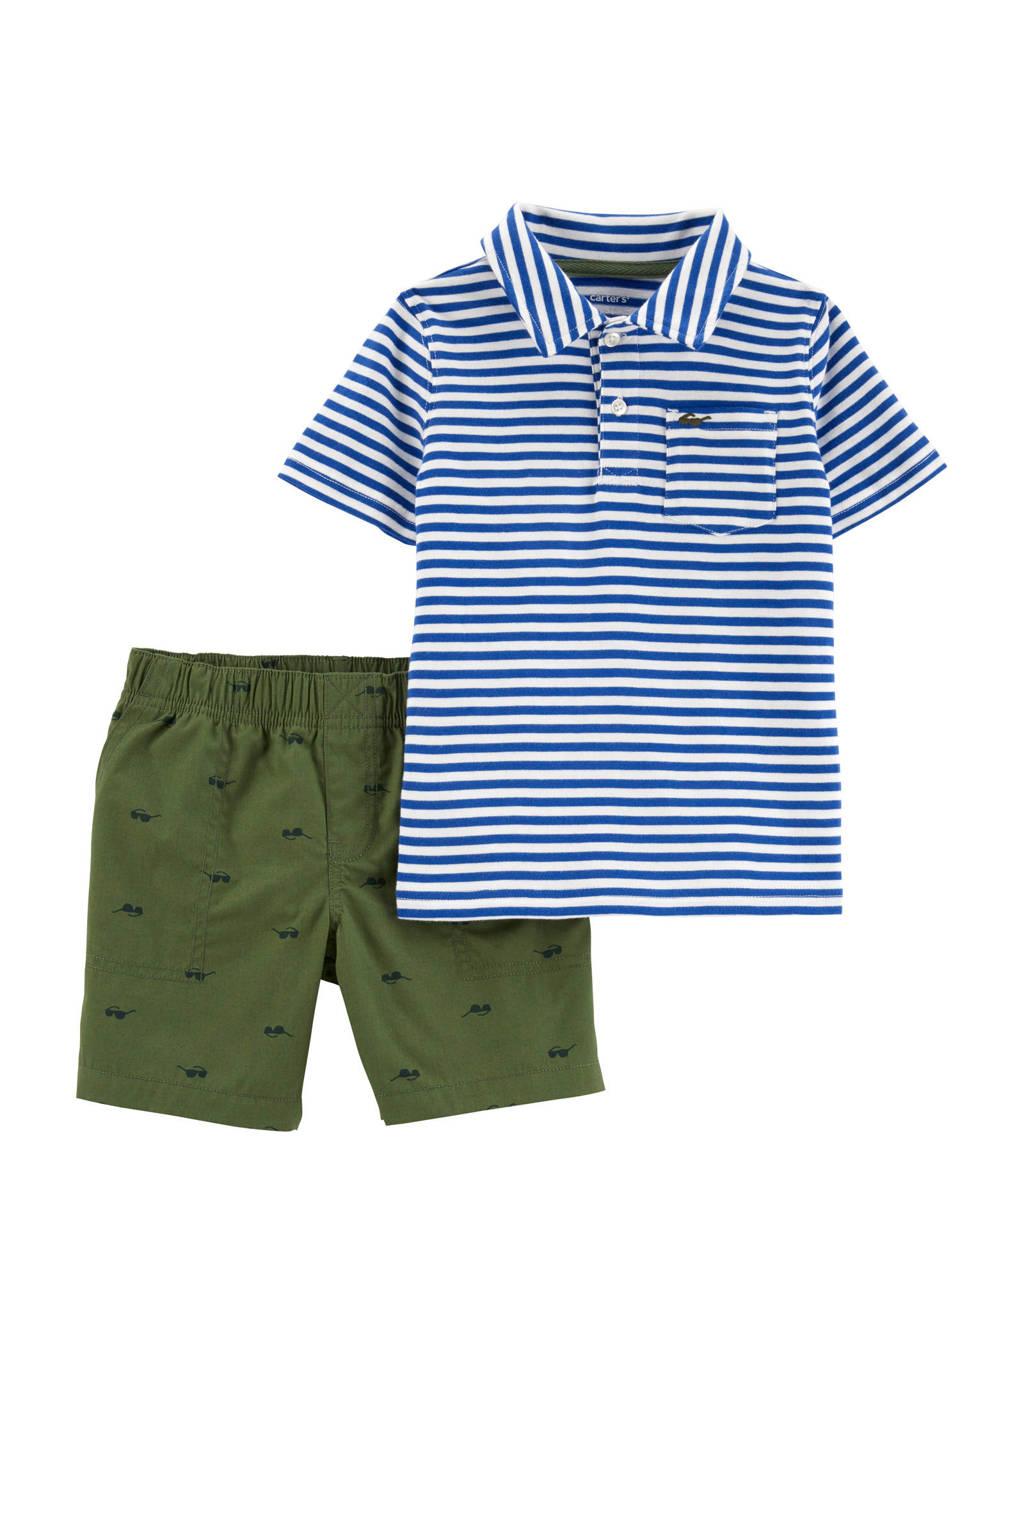 Carter's polo + short, Blauw/wit/groen